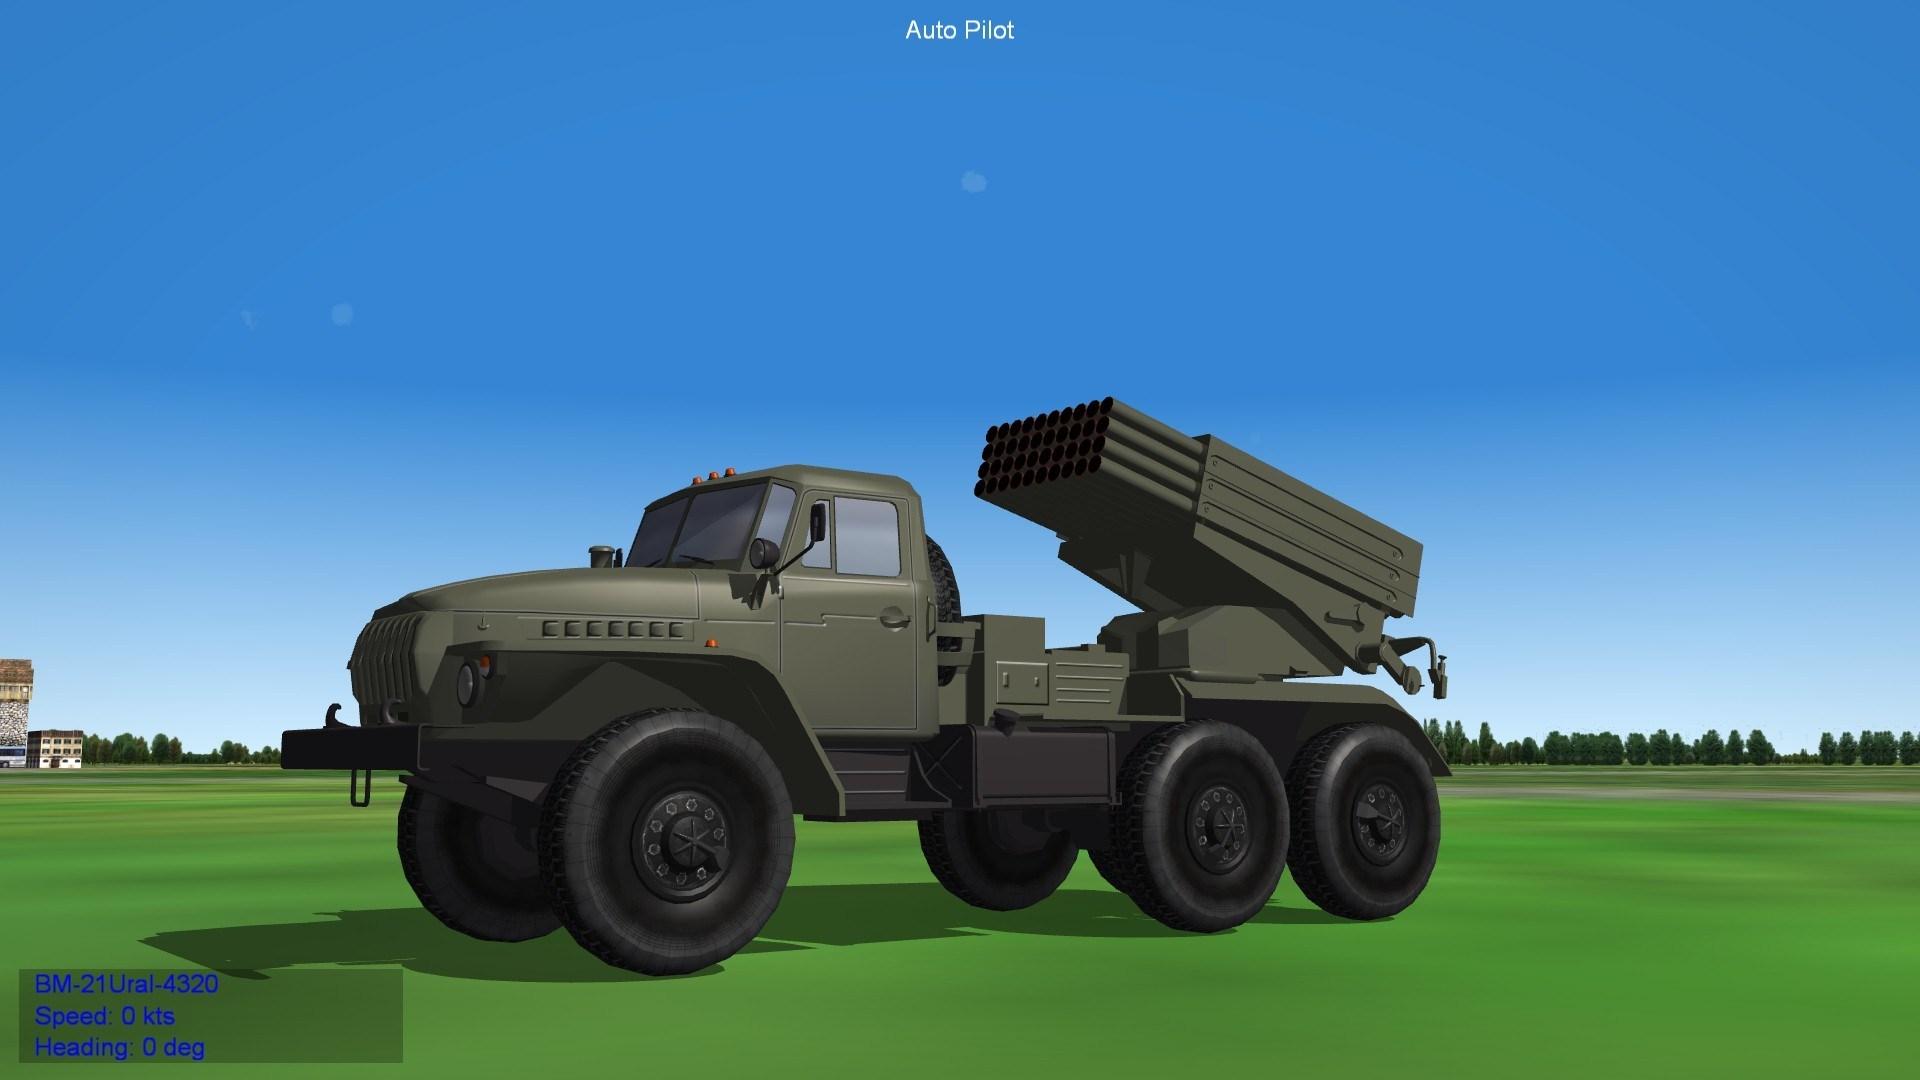 BM-21 Grad on Ural Track